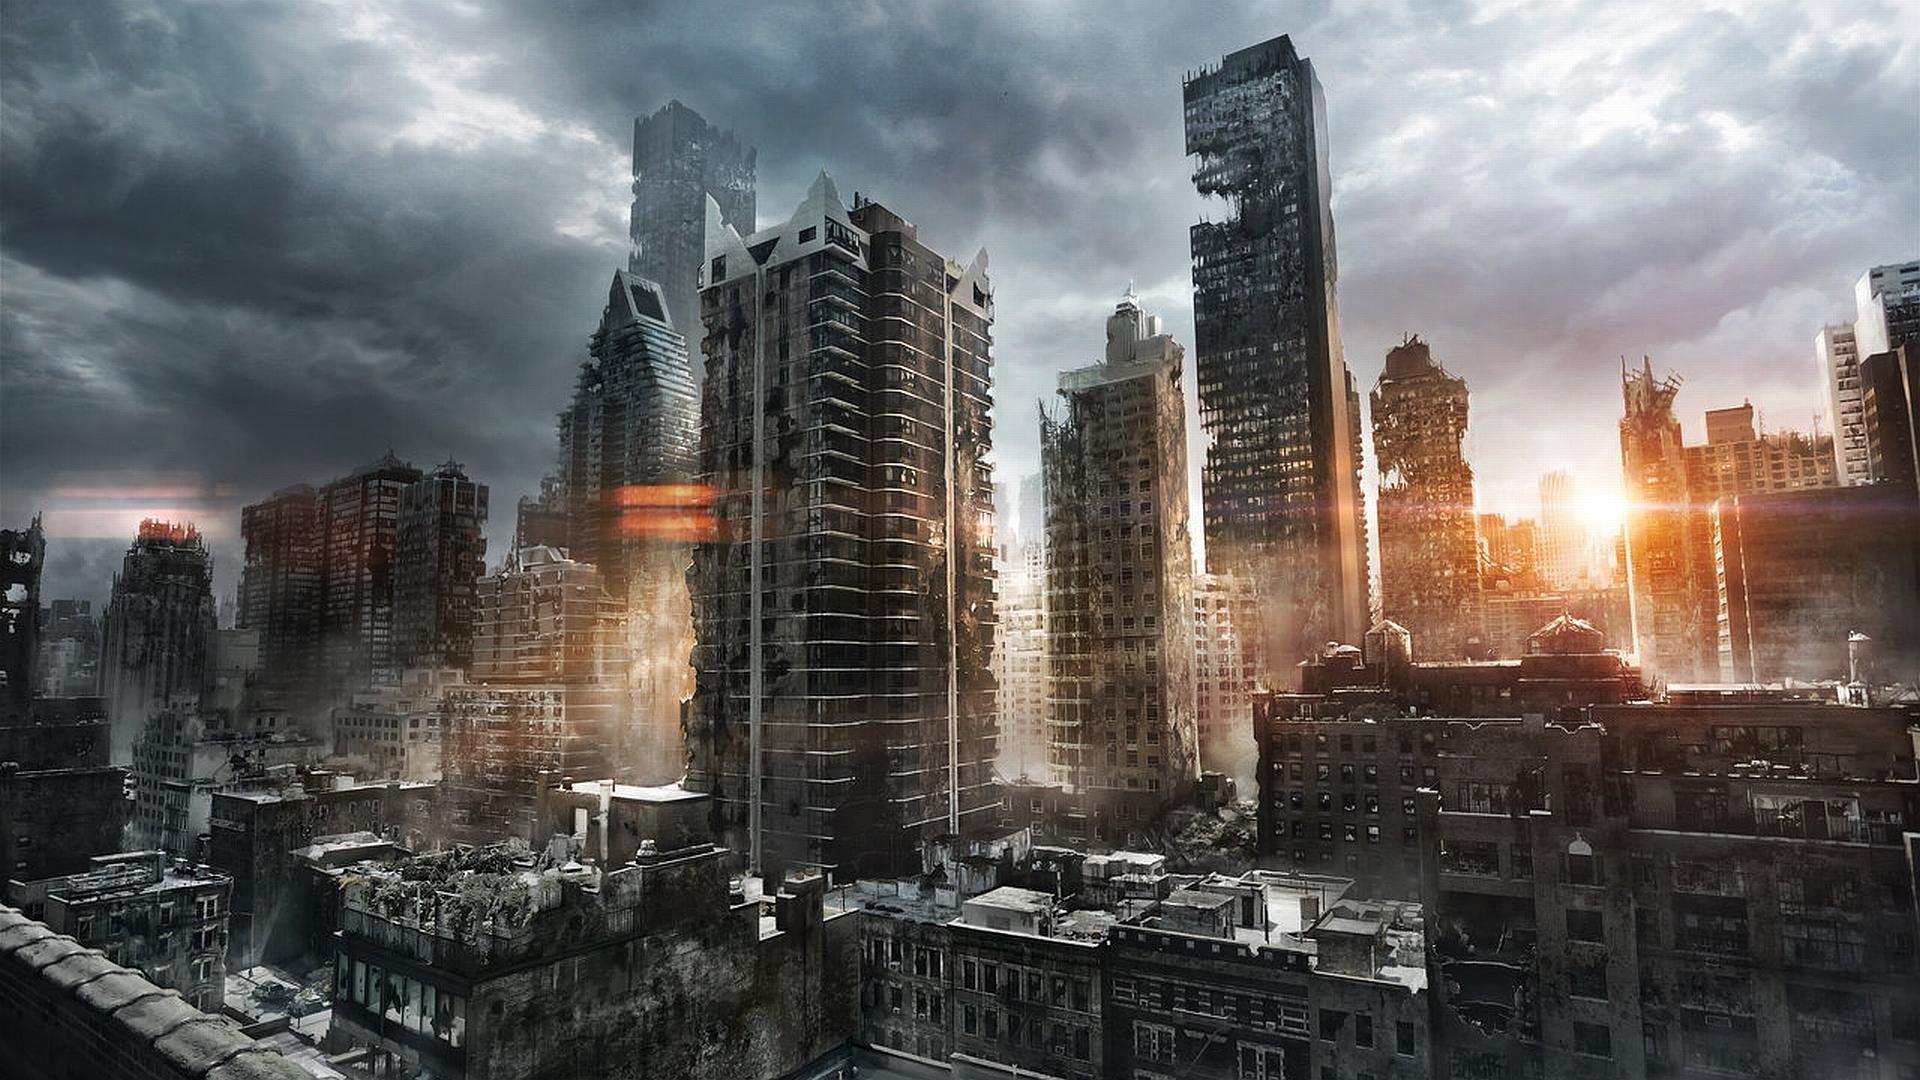 post apocalyptic landscape – Google Search | Landscape | Pinterest |  Apocalypse, Post apo and Post apocalyptic